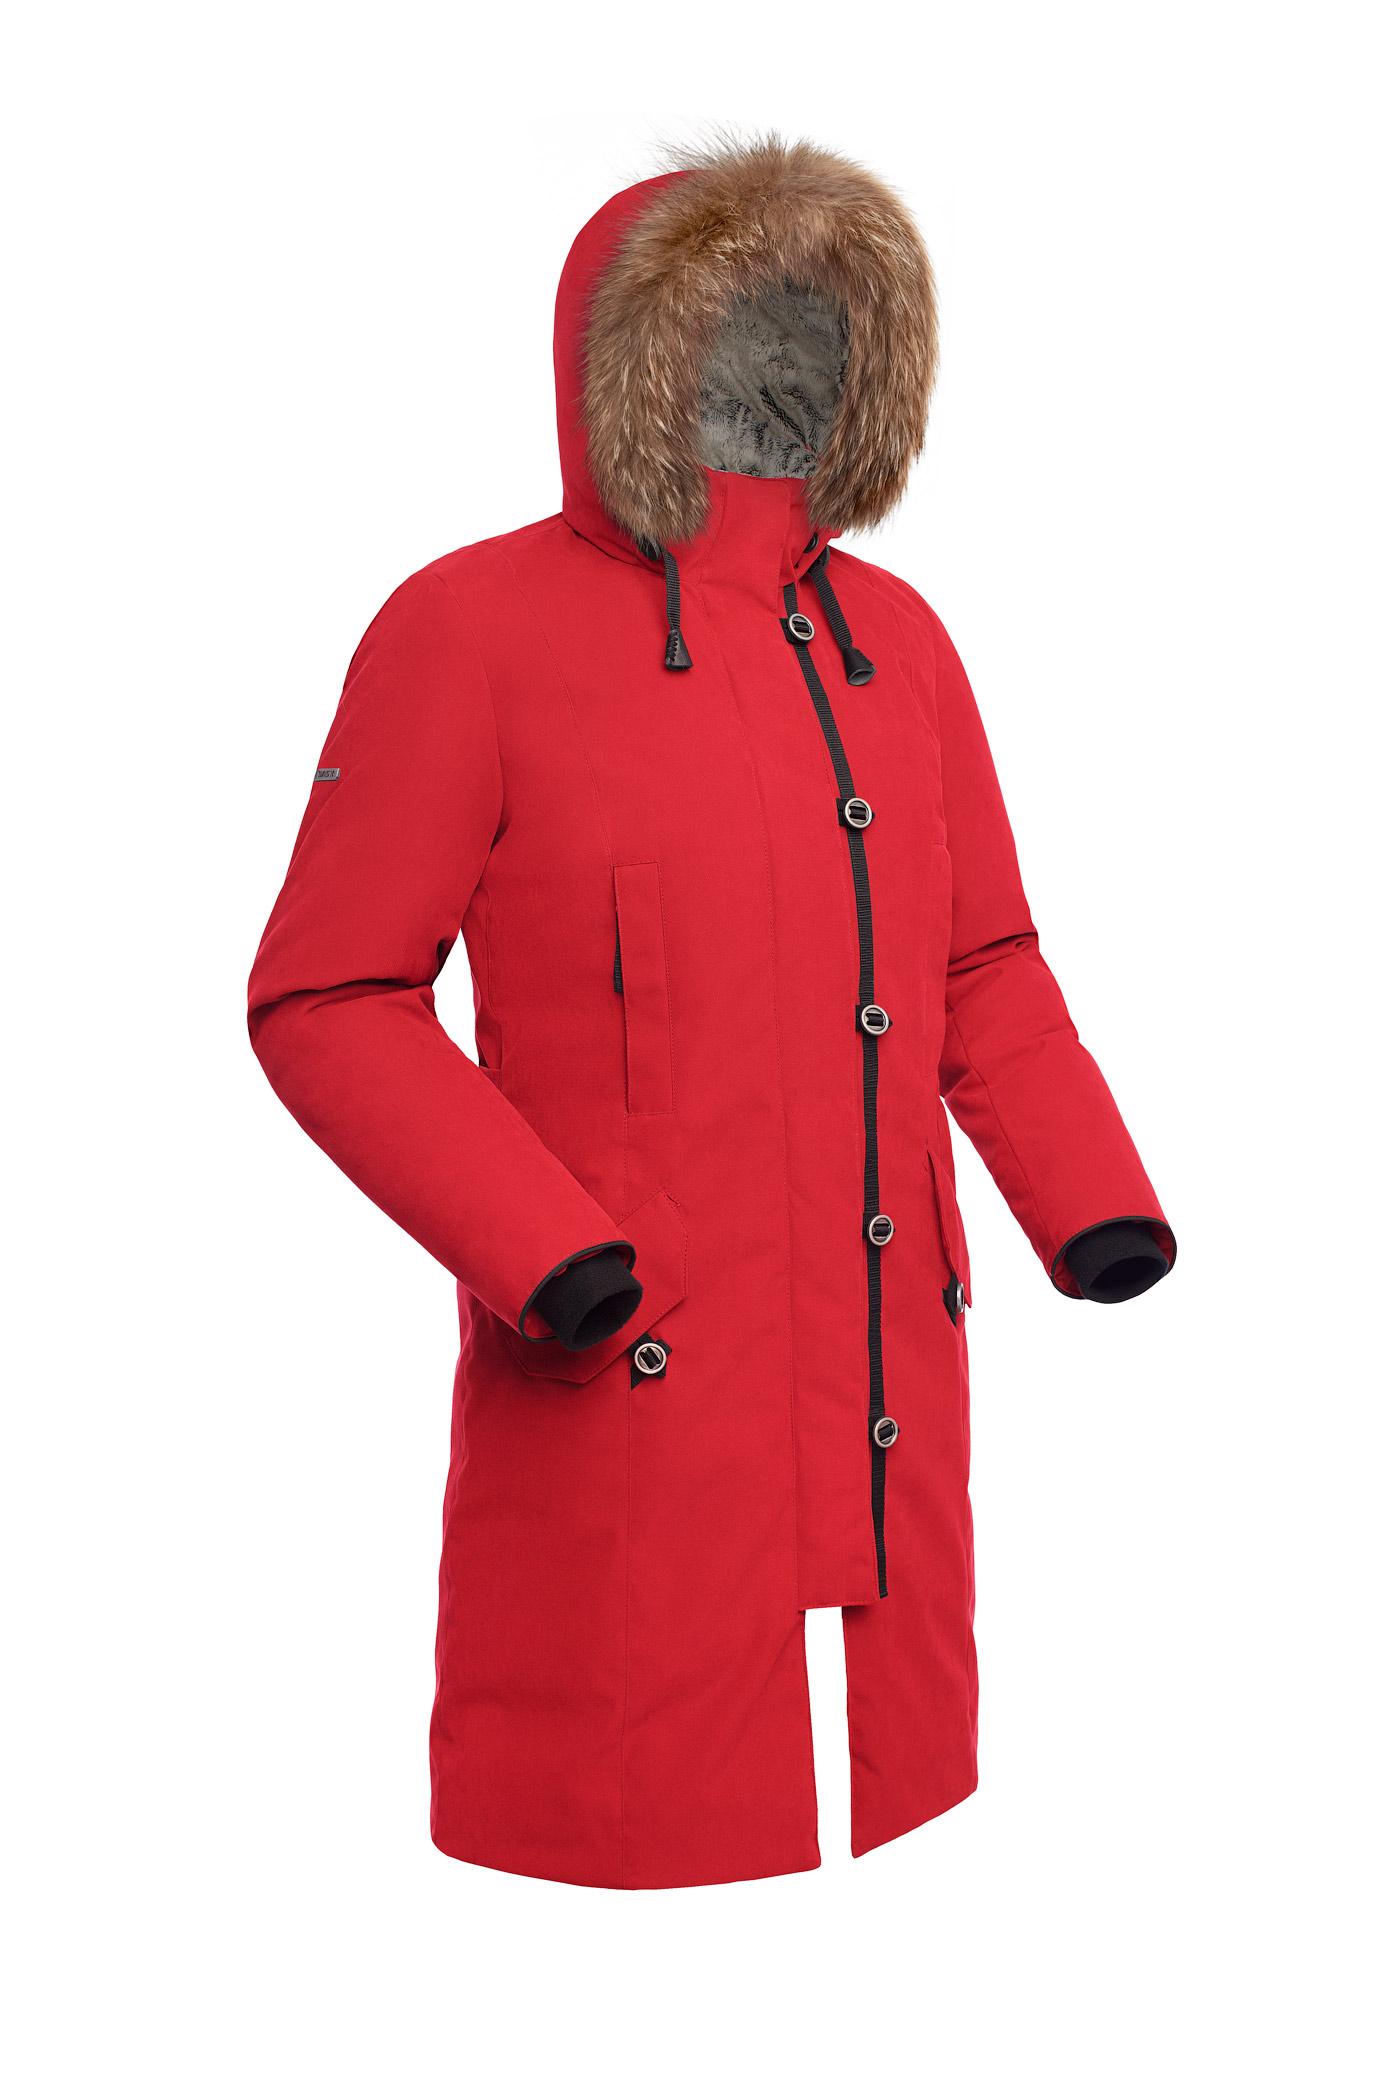 Пальто пуховое женское BASK HATANGA V2 красное, Пальто - арт. 971260409